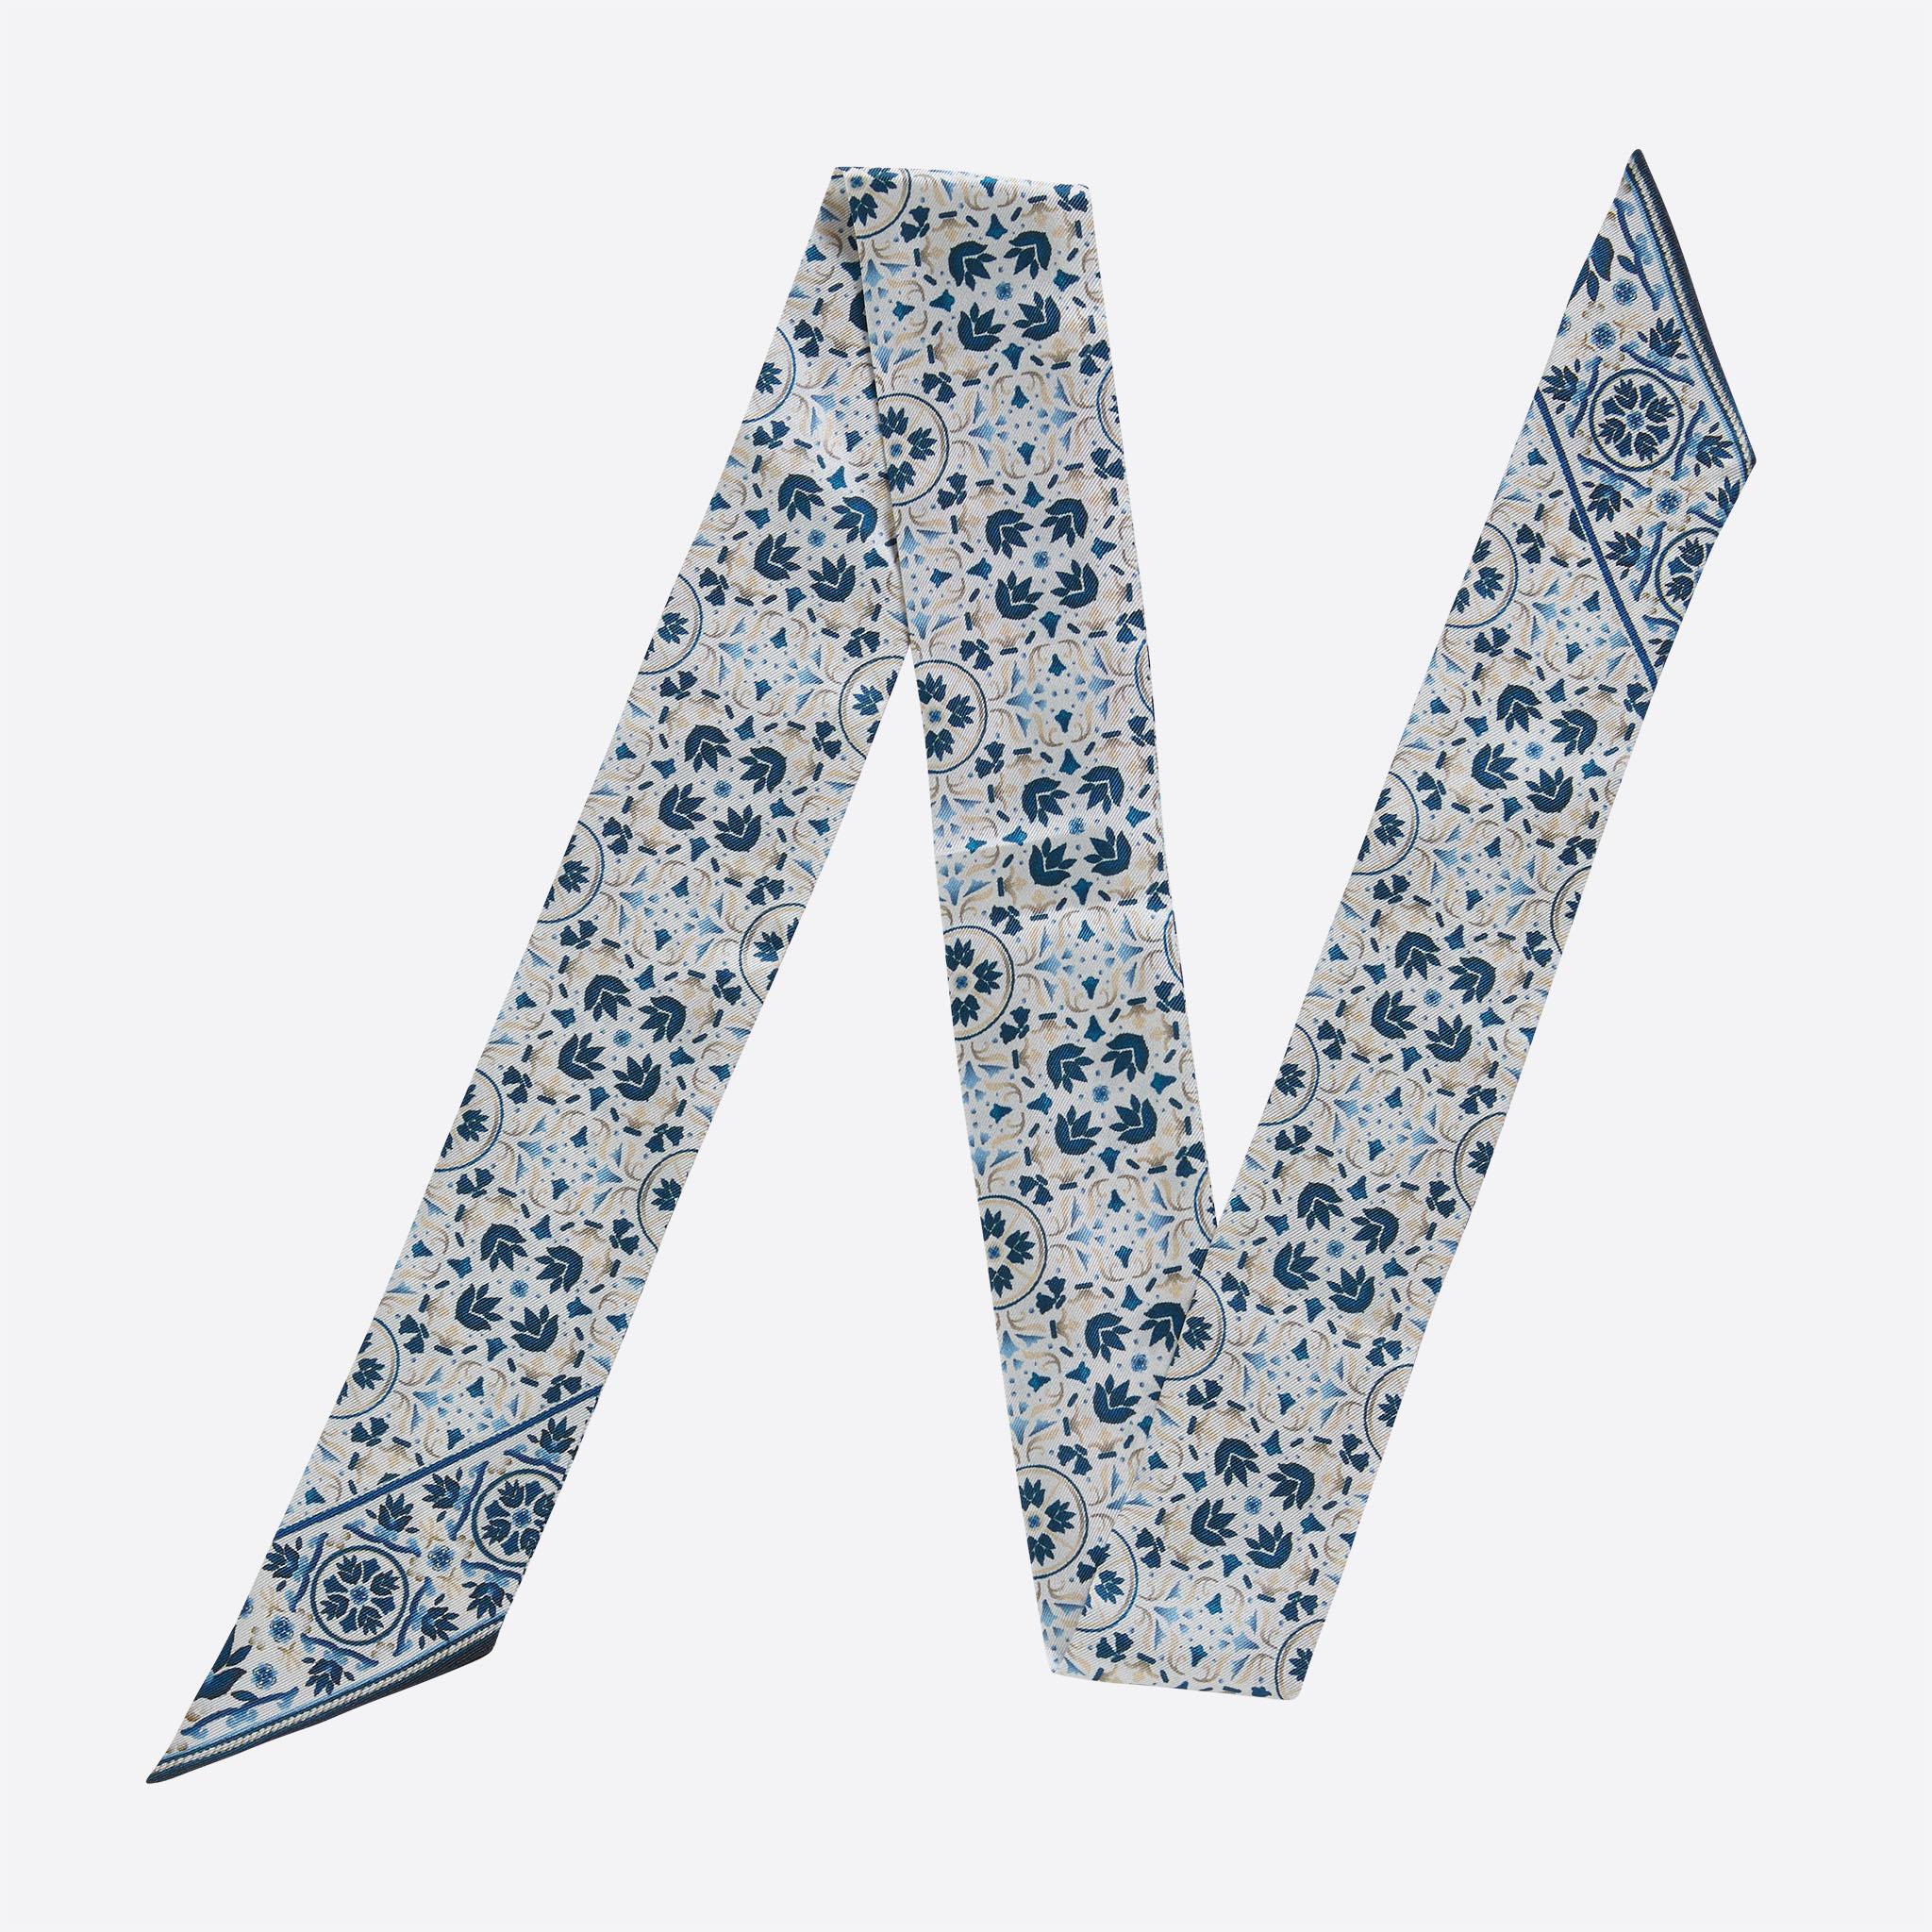 Lalouette Moroccan print skinny silk scarf flatlay